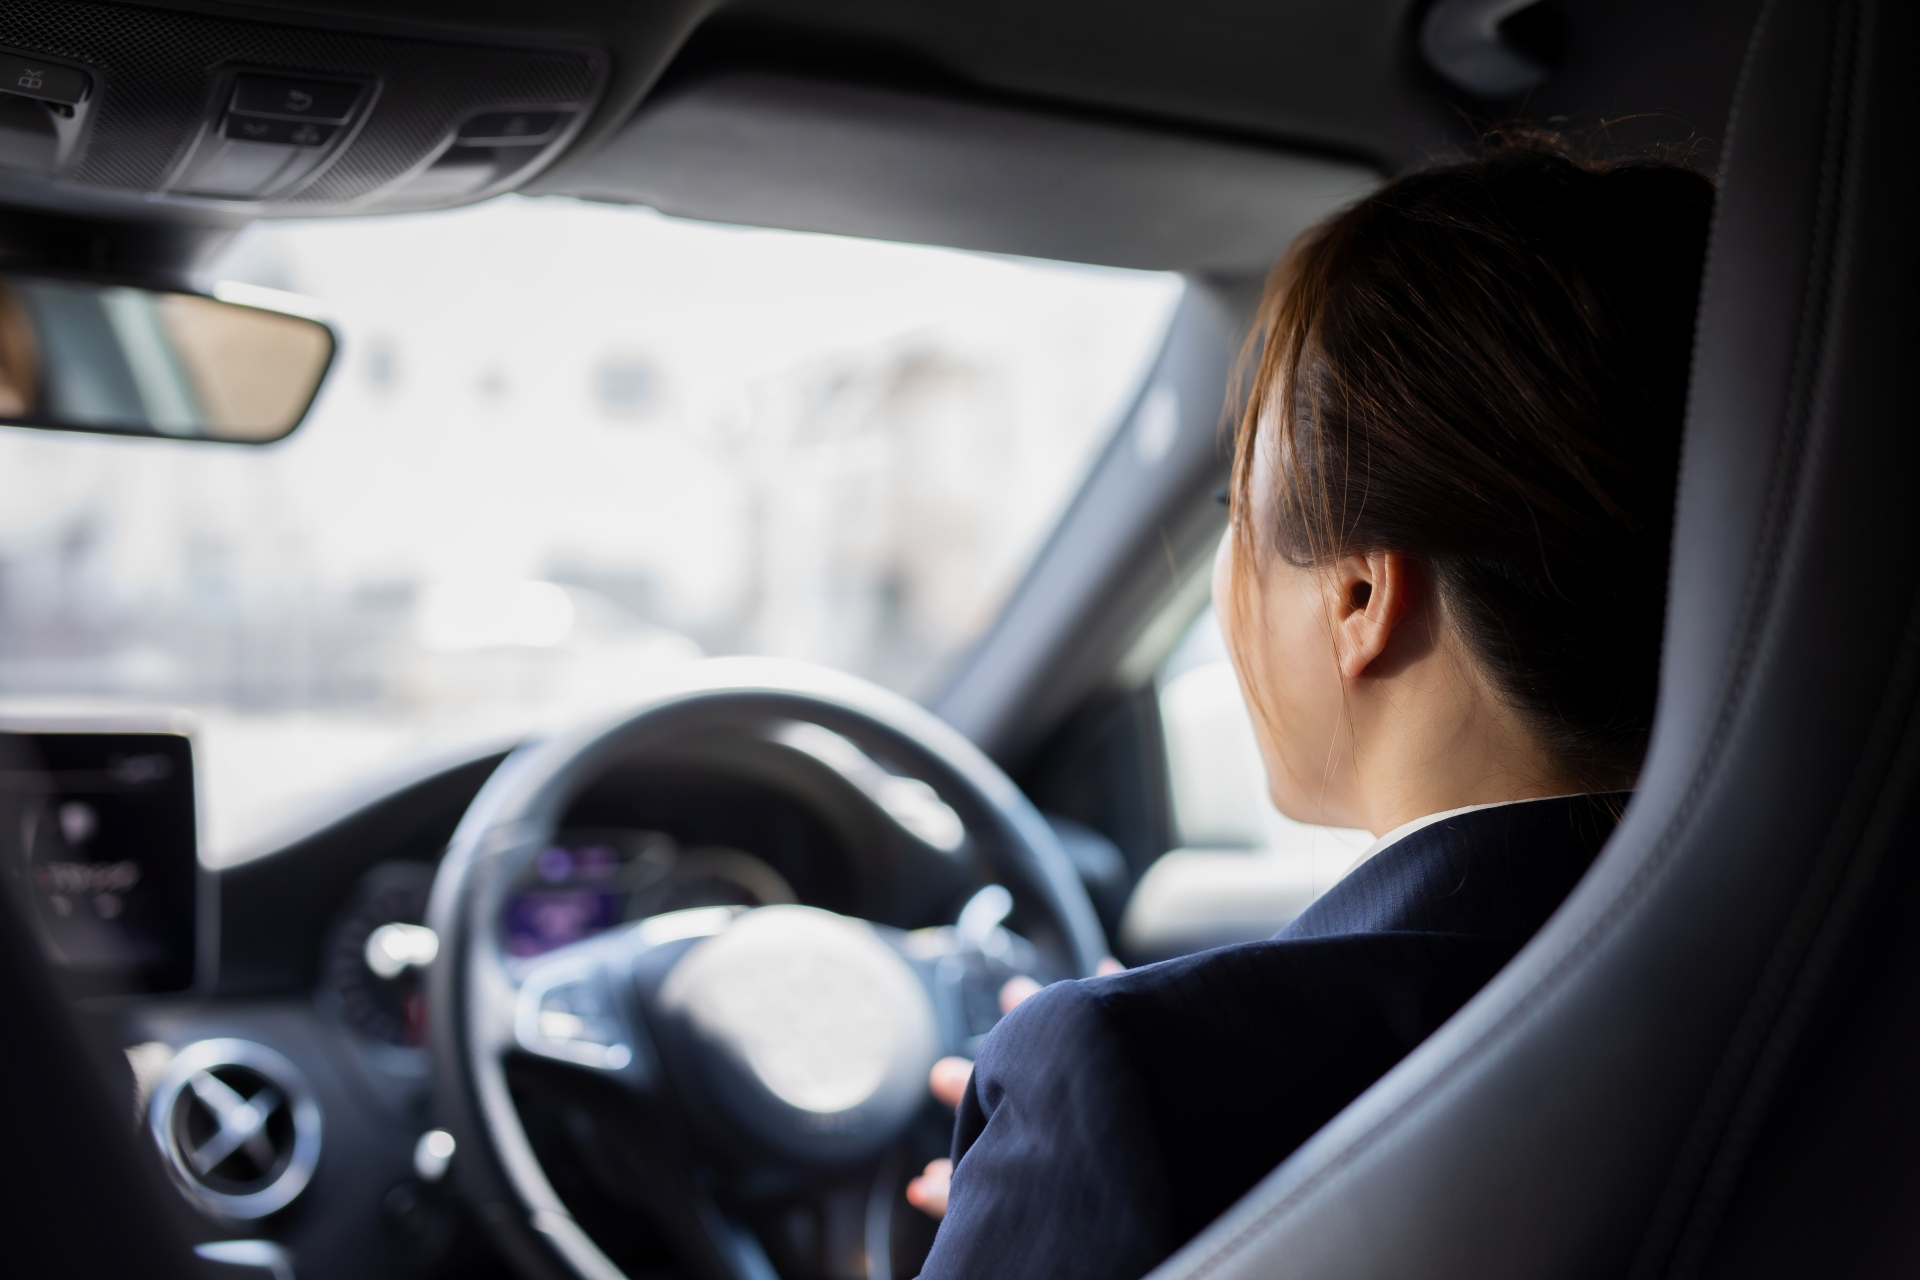 ACサイトタクシー画像